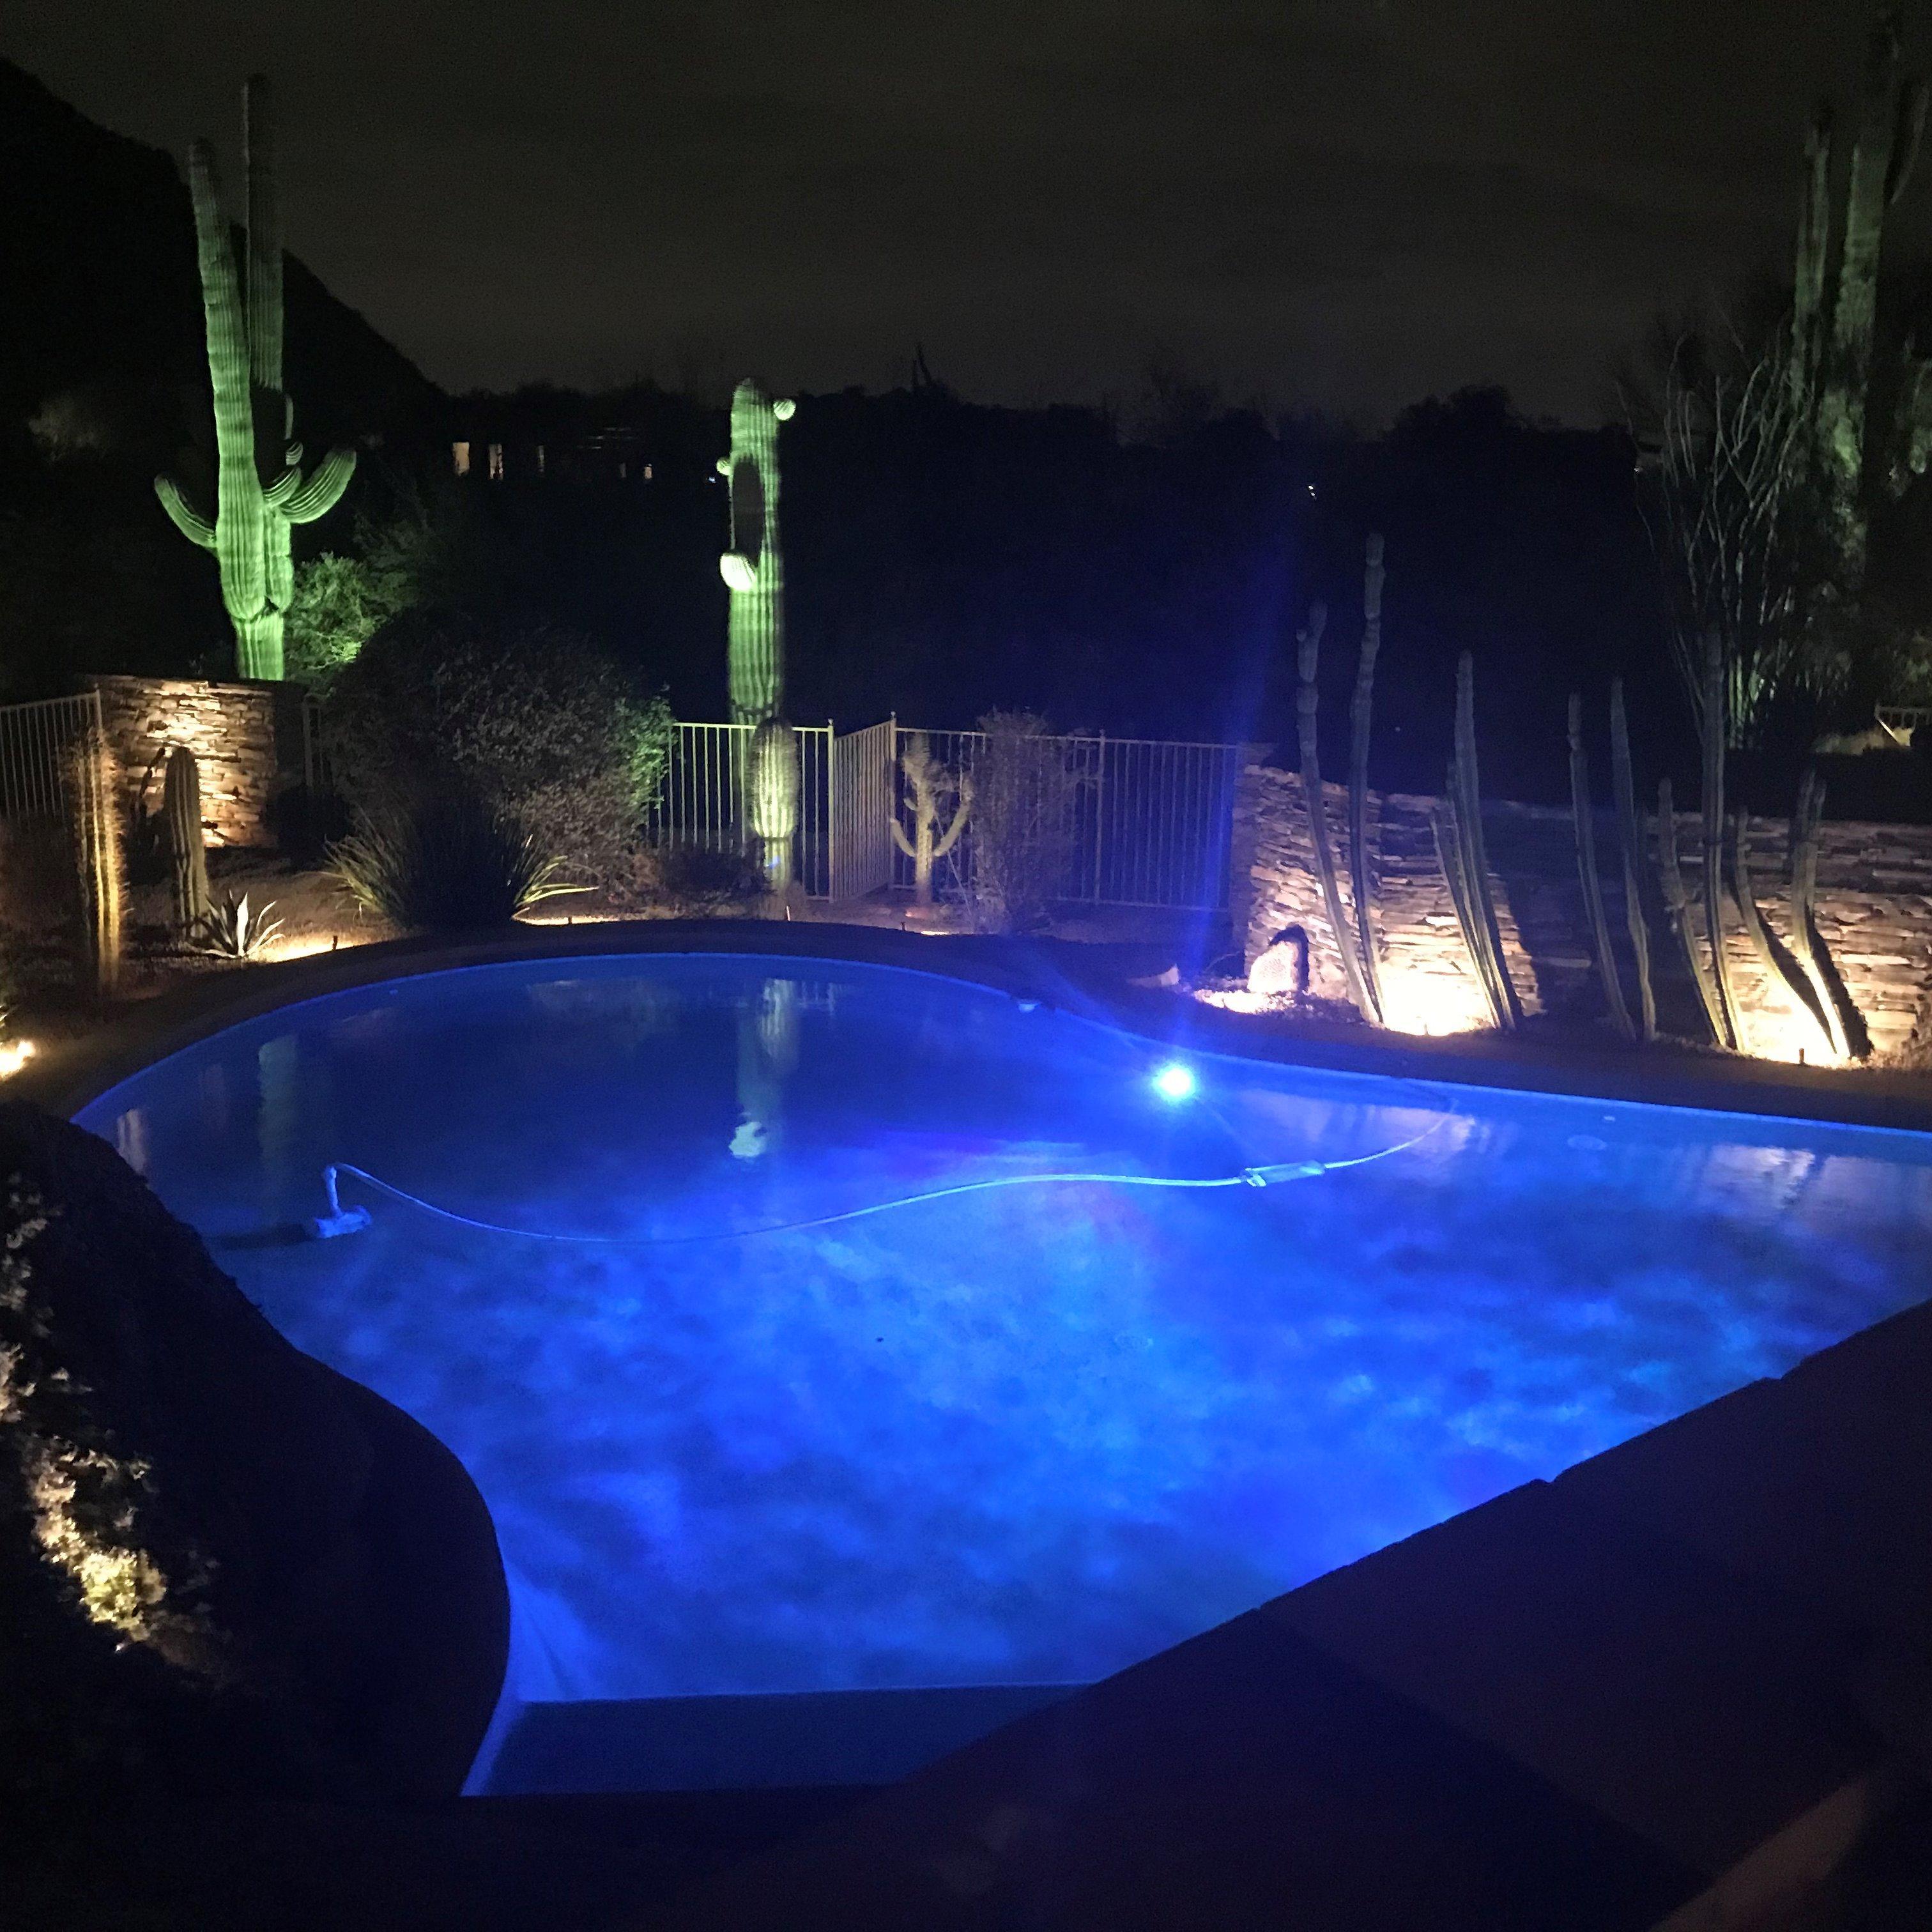 Poolguys Swimming Pool Service